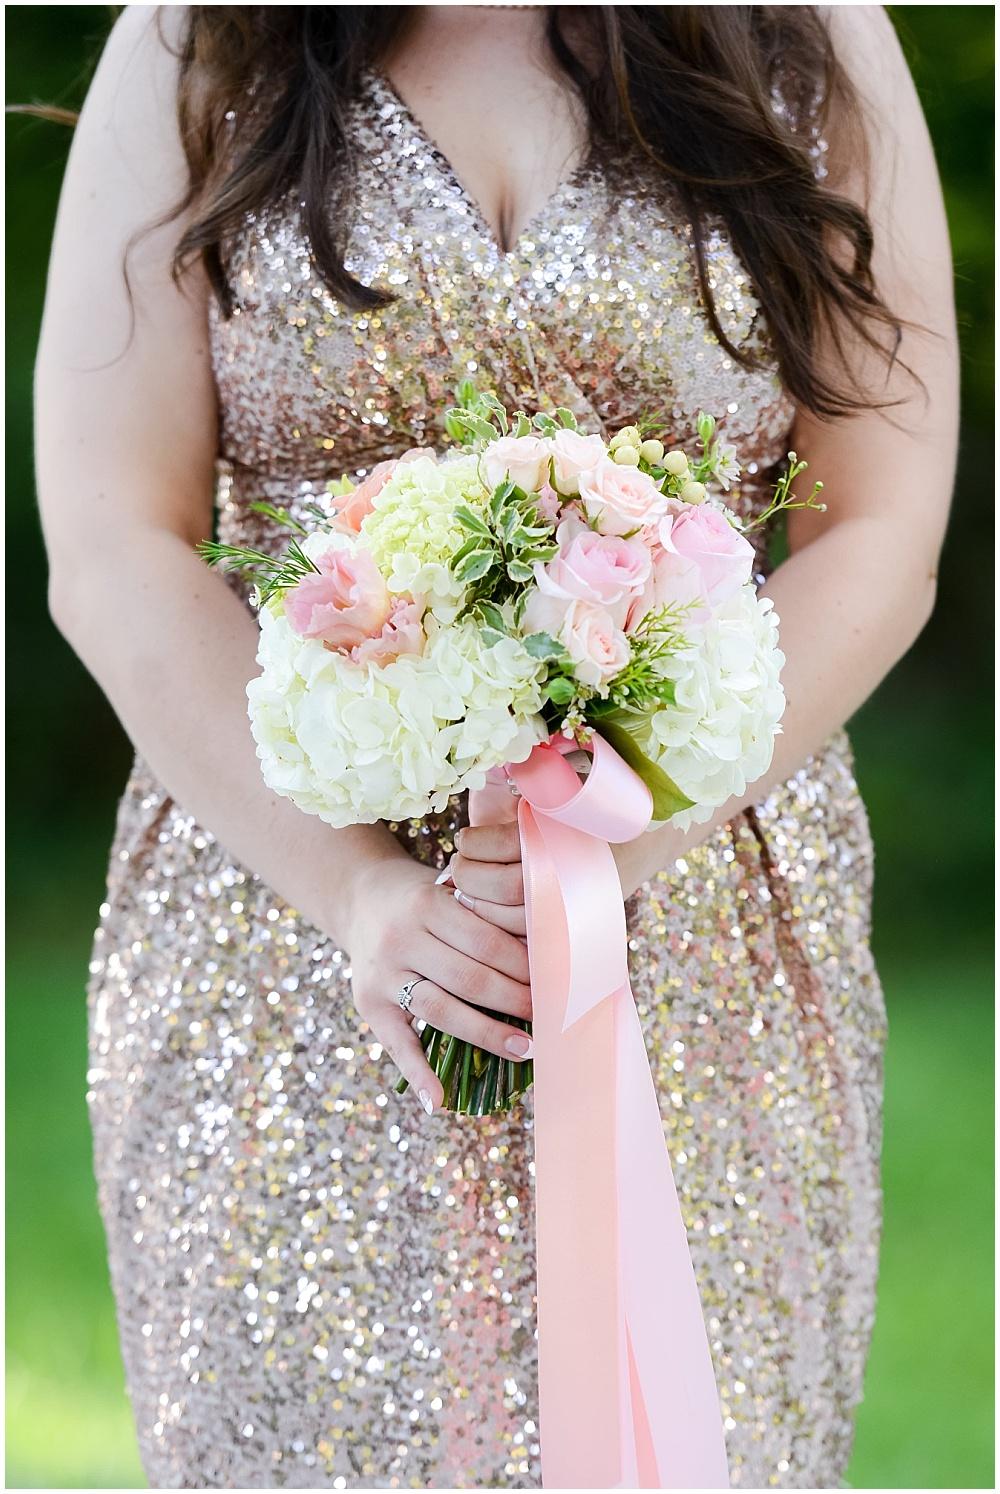 Gold glitter bridesmaid dress with blush, white and green bridesmaid bouquet | Mustard Seed Gardens Wedding by Sara Ackermann Photography & Jessica Dum Wedding Coordination